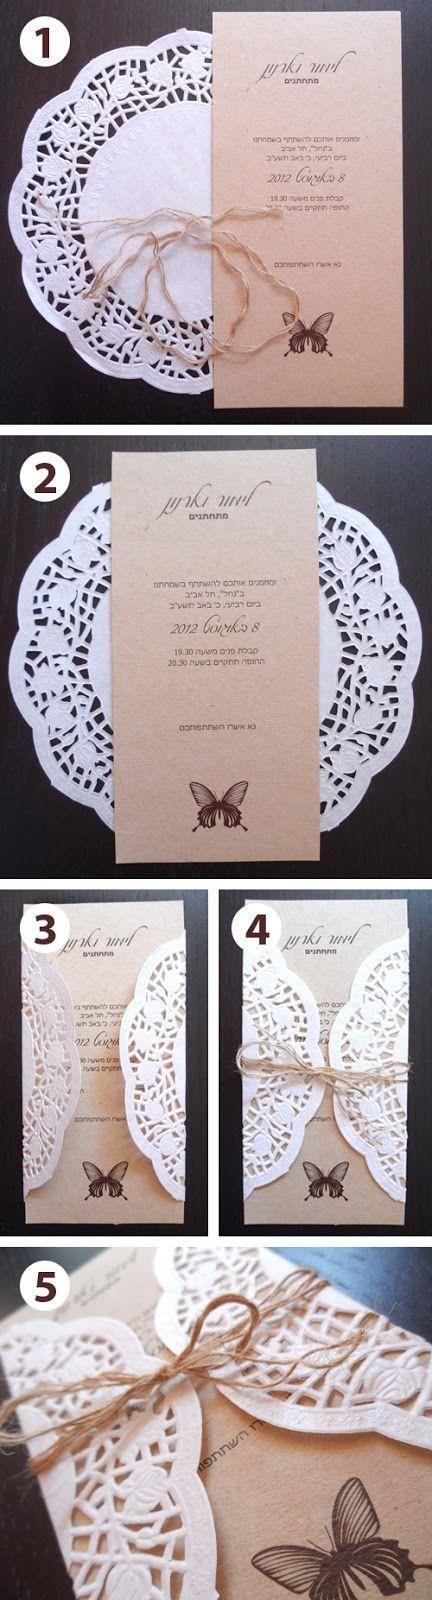 Diy wedding invitation ideas.